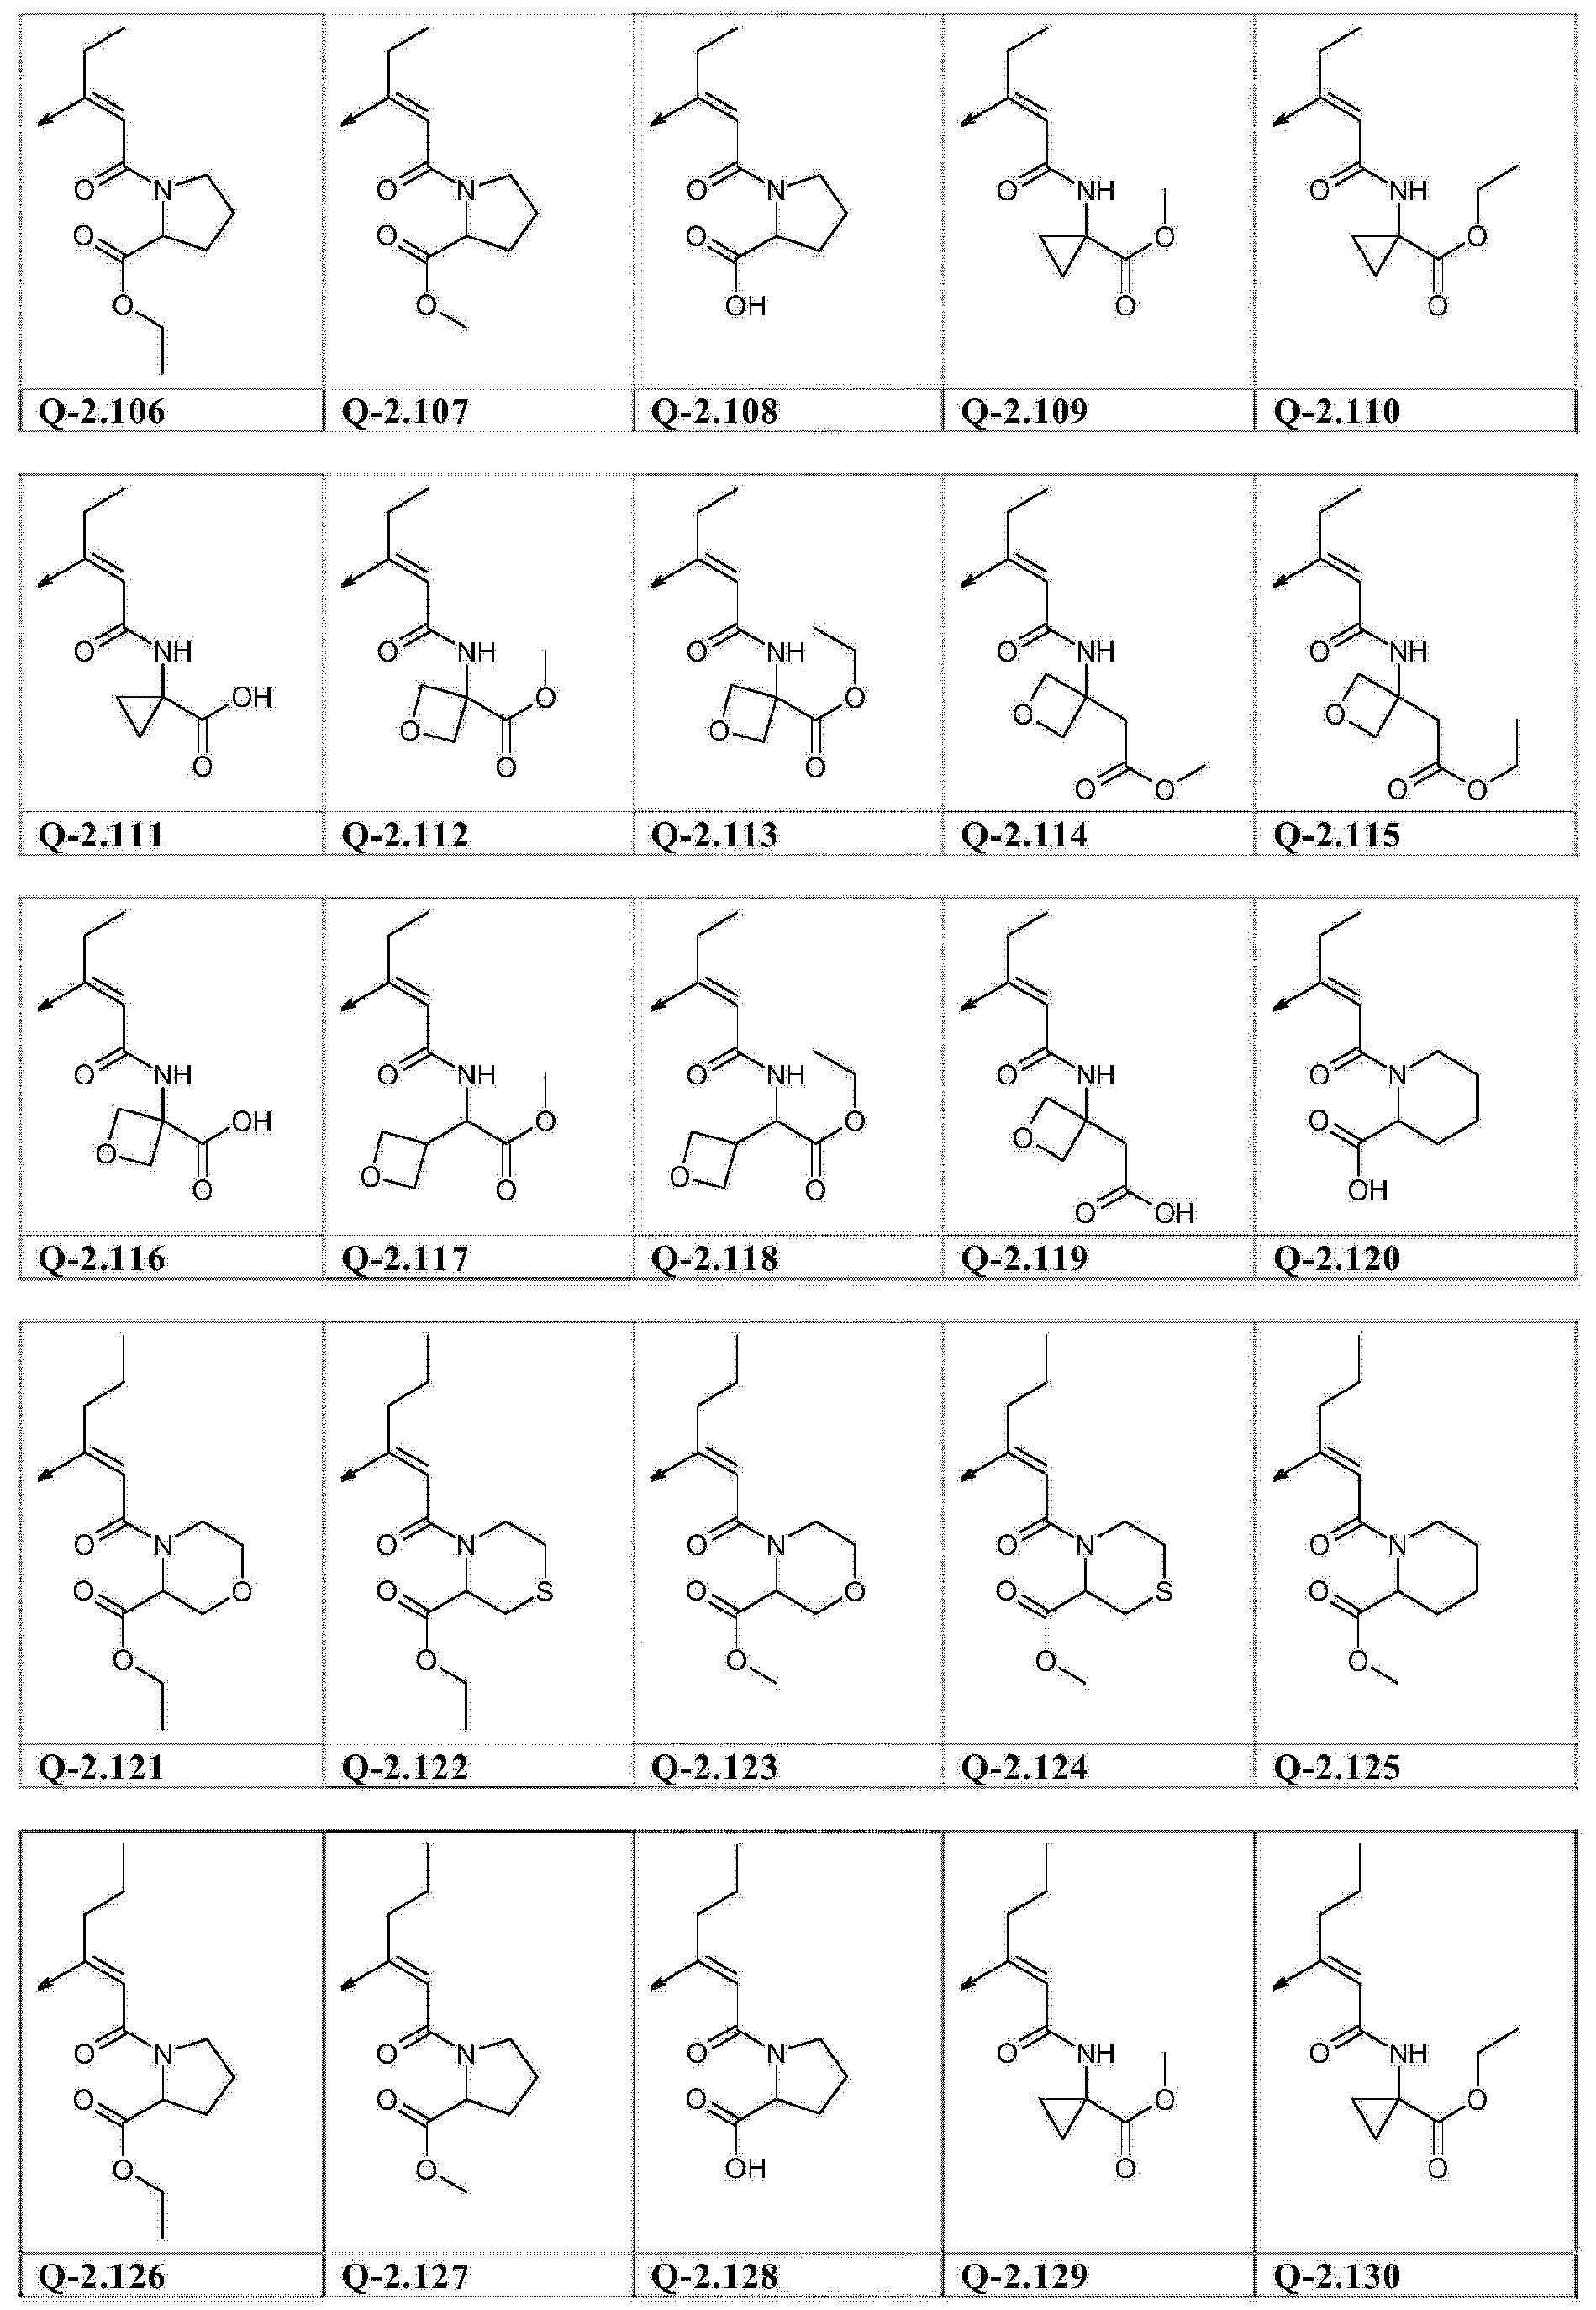 CN103476750A - Substituted 5-(bicyclo[4 1 0]hept-3-en-2-yl)-penta-2